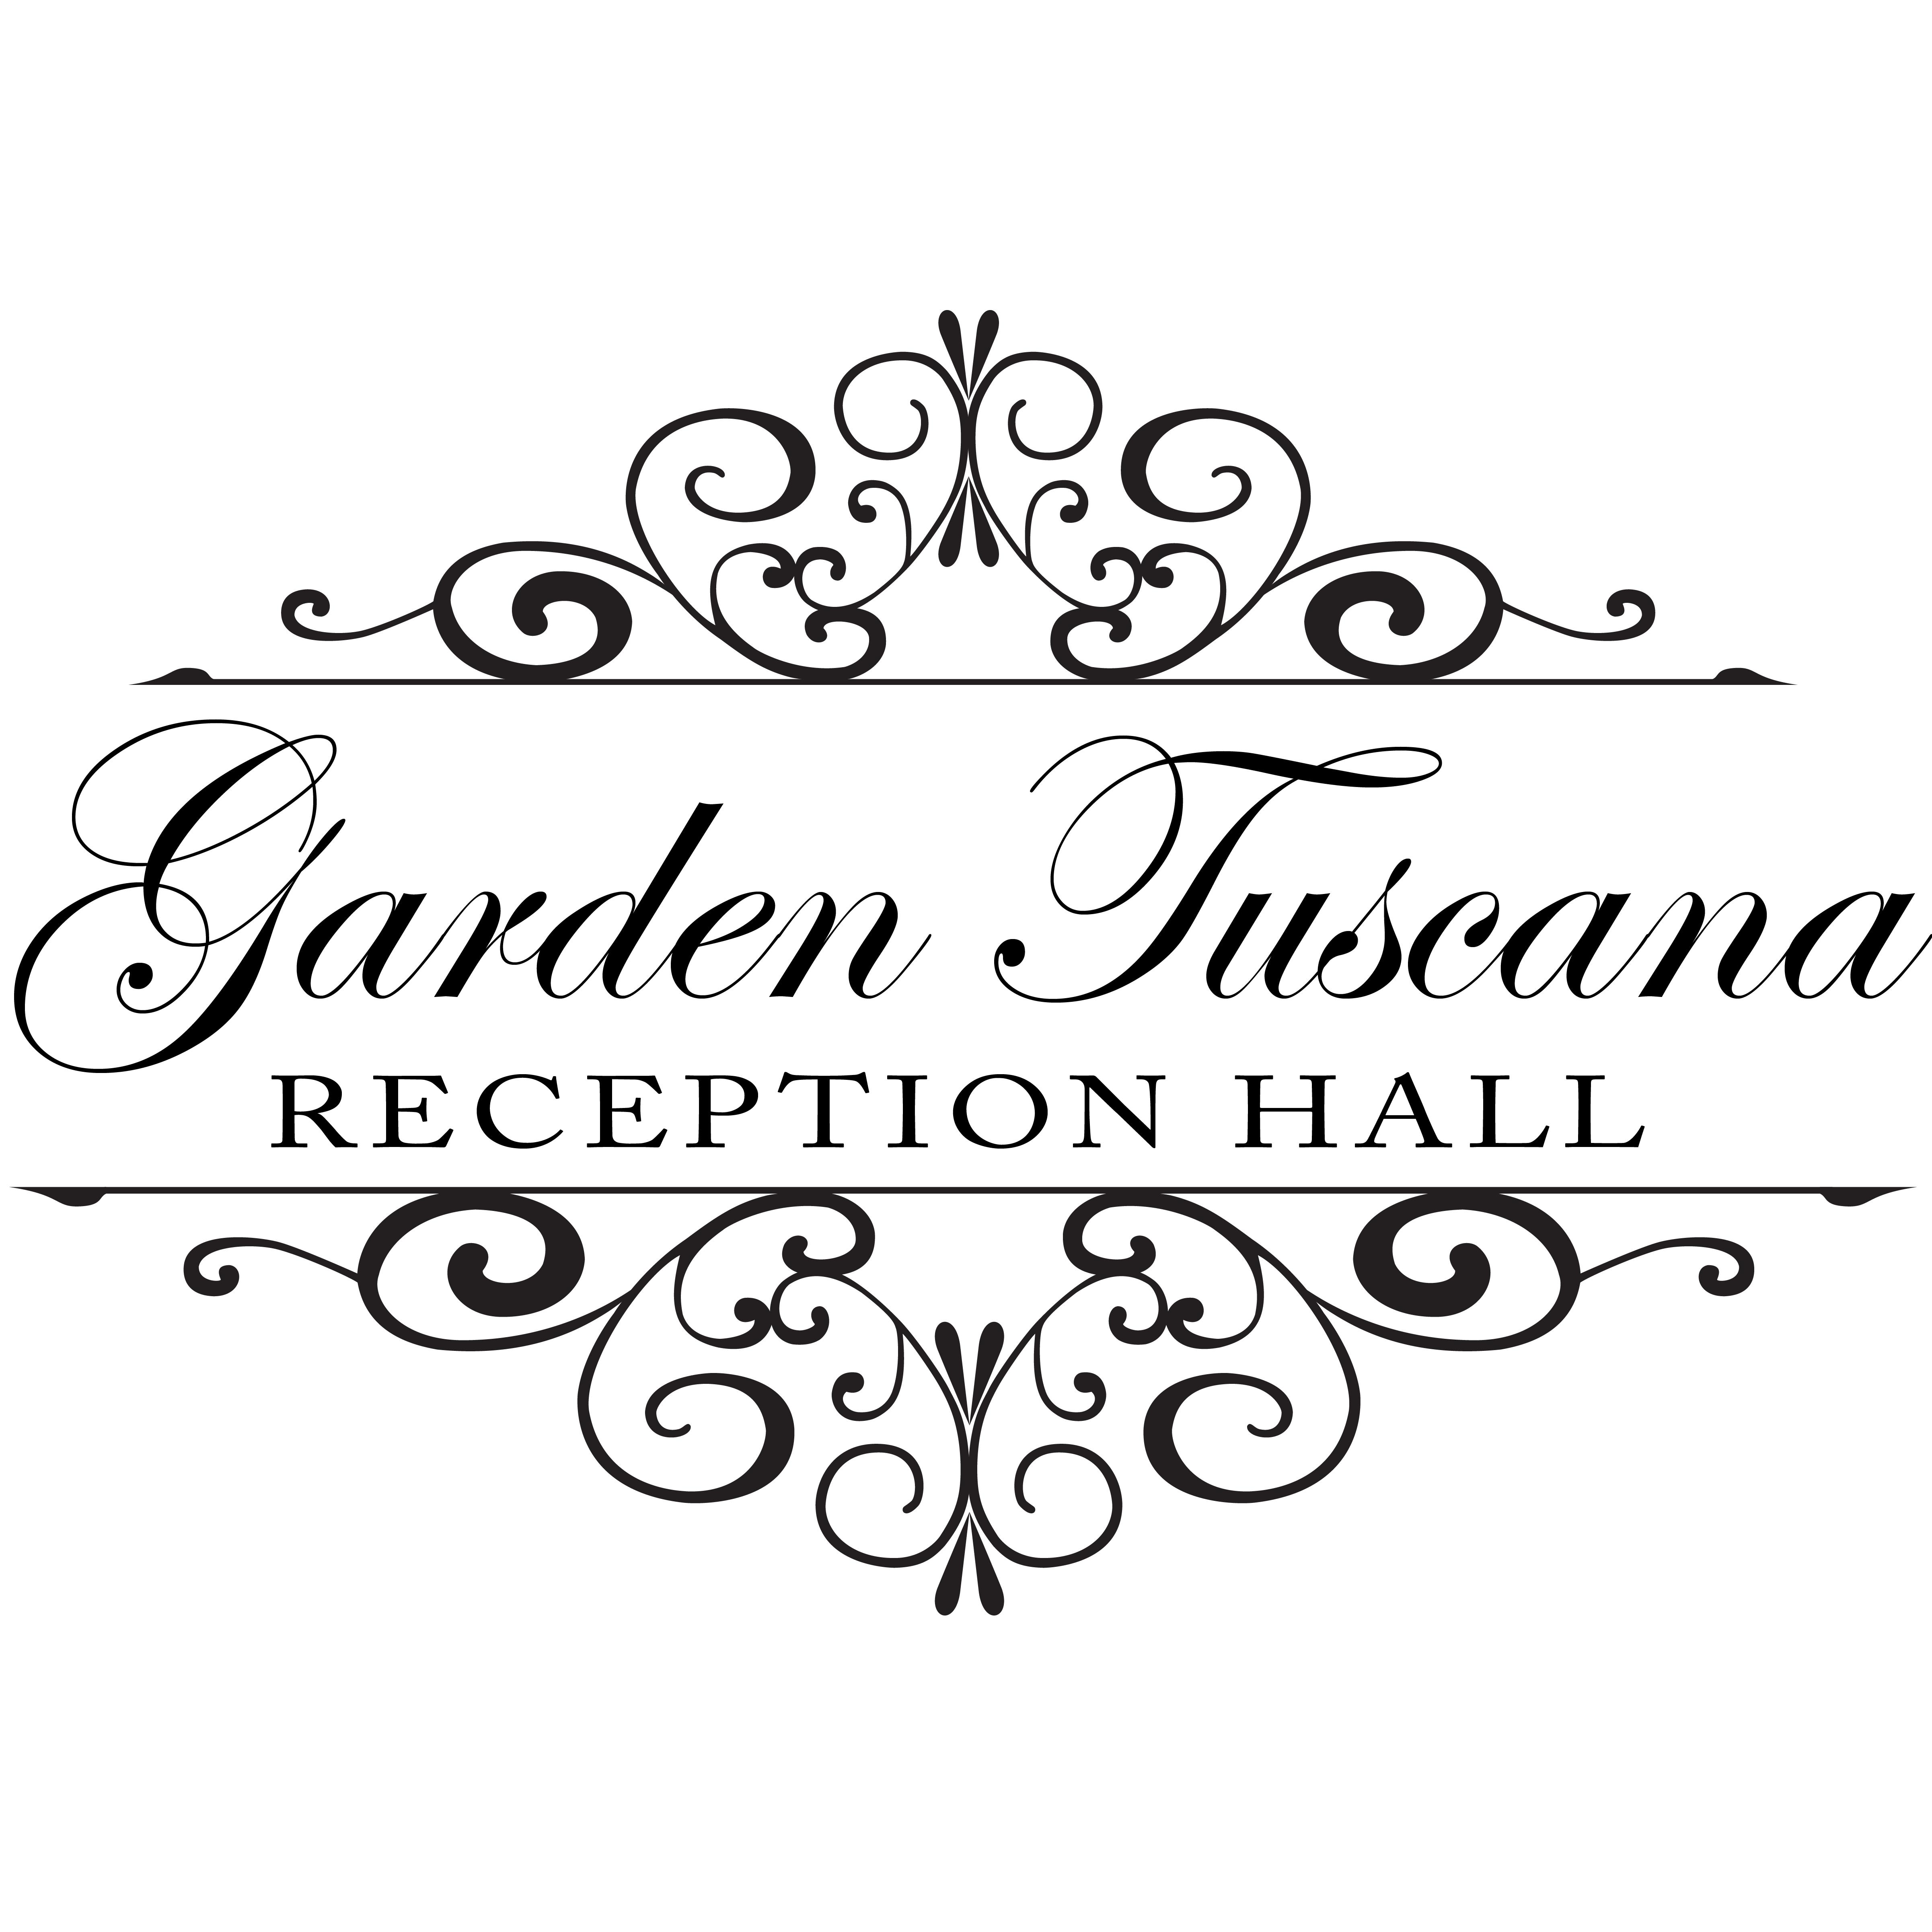 Garden Tuscana